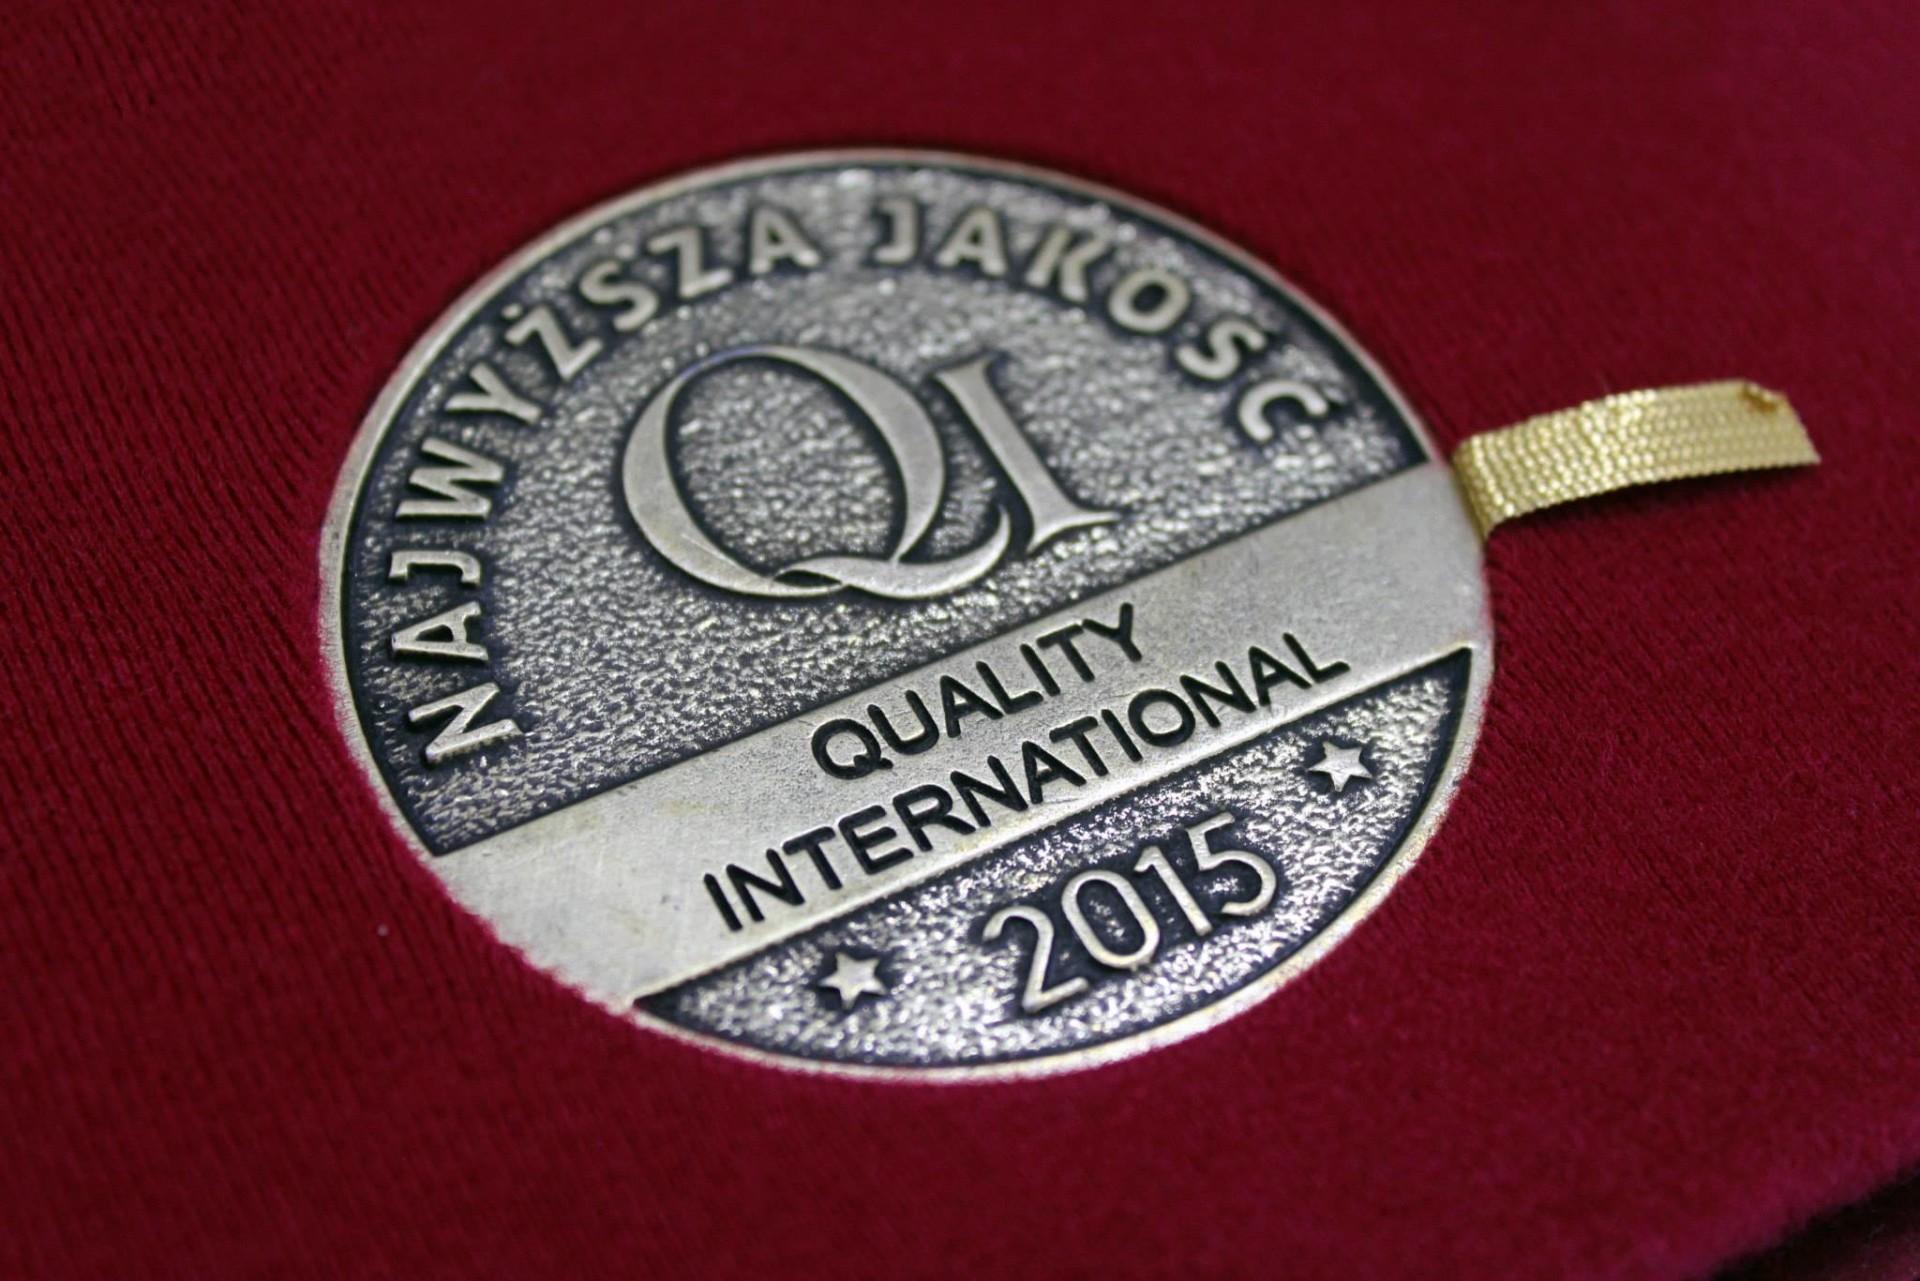 Quality International 2015 Award